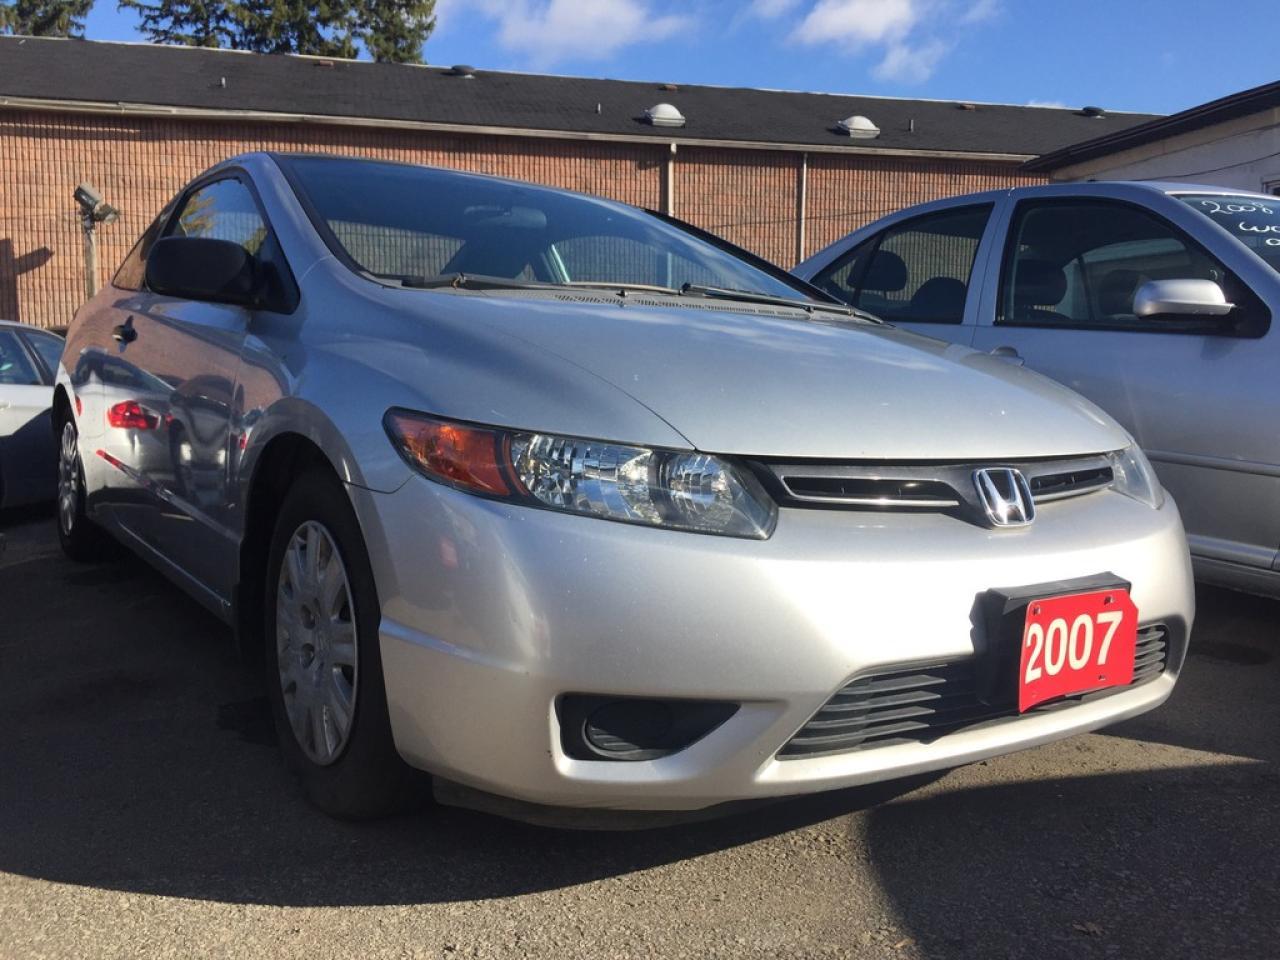 2007 Honda Civic GAS Saver All Power Options Very Clean